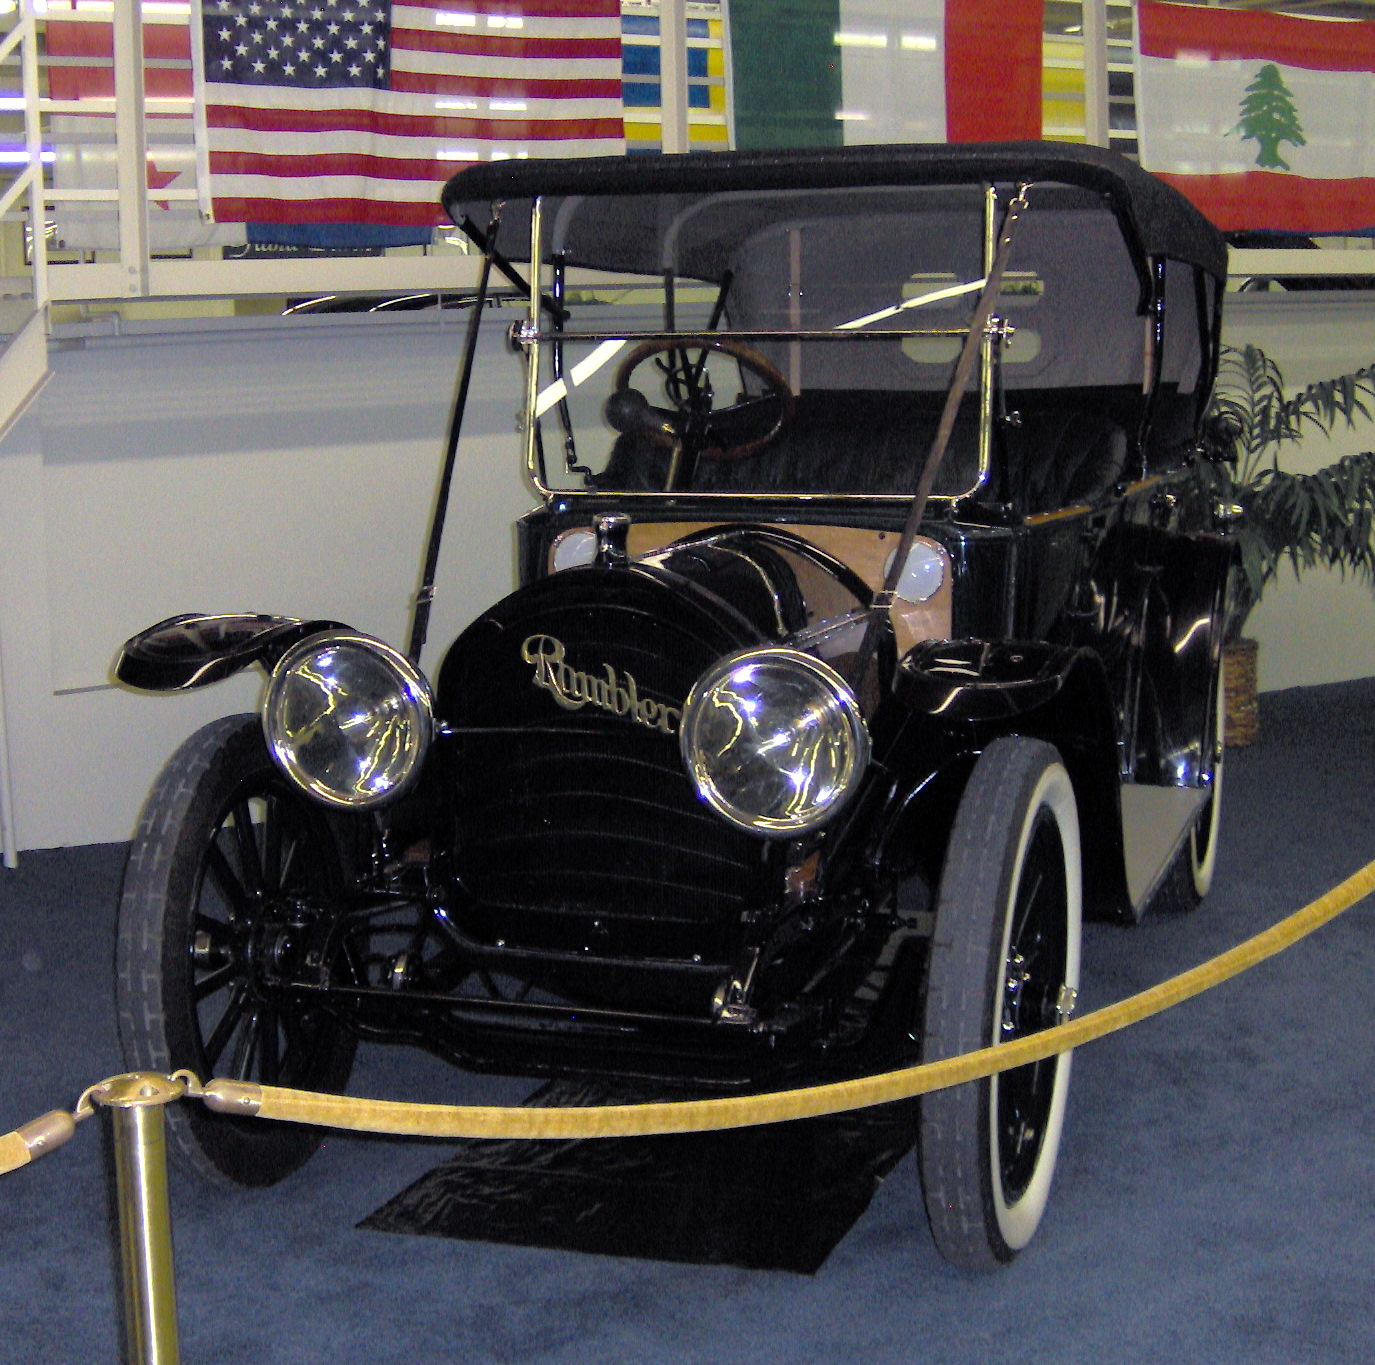 American Cars Company